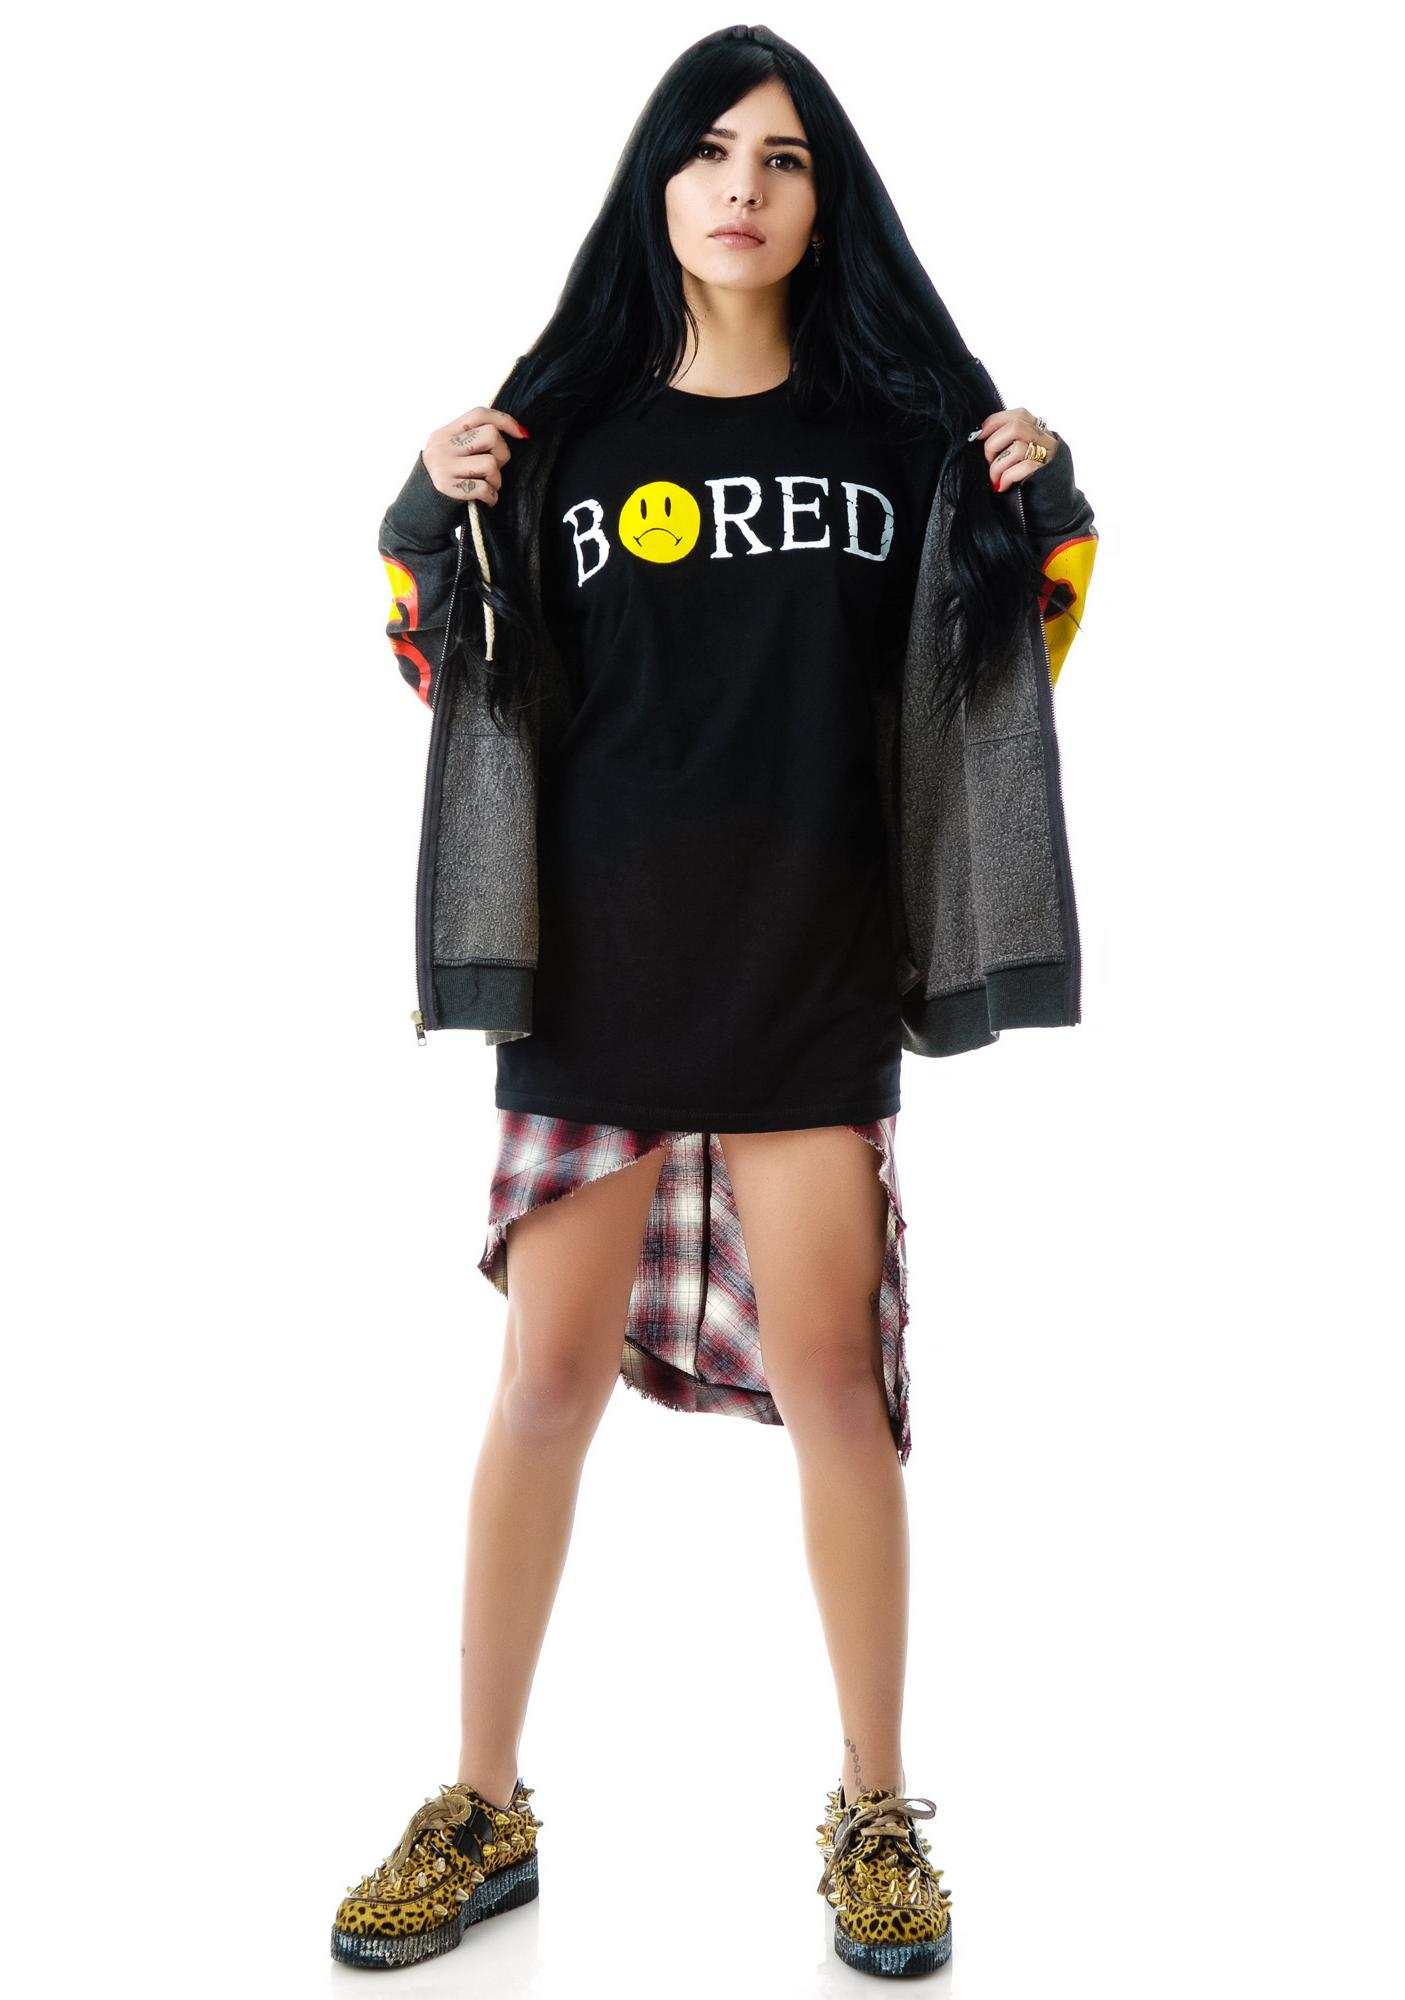 Bad Acid Bored Shirt